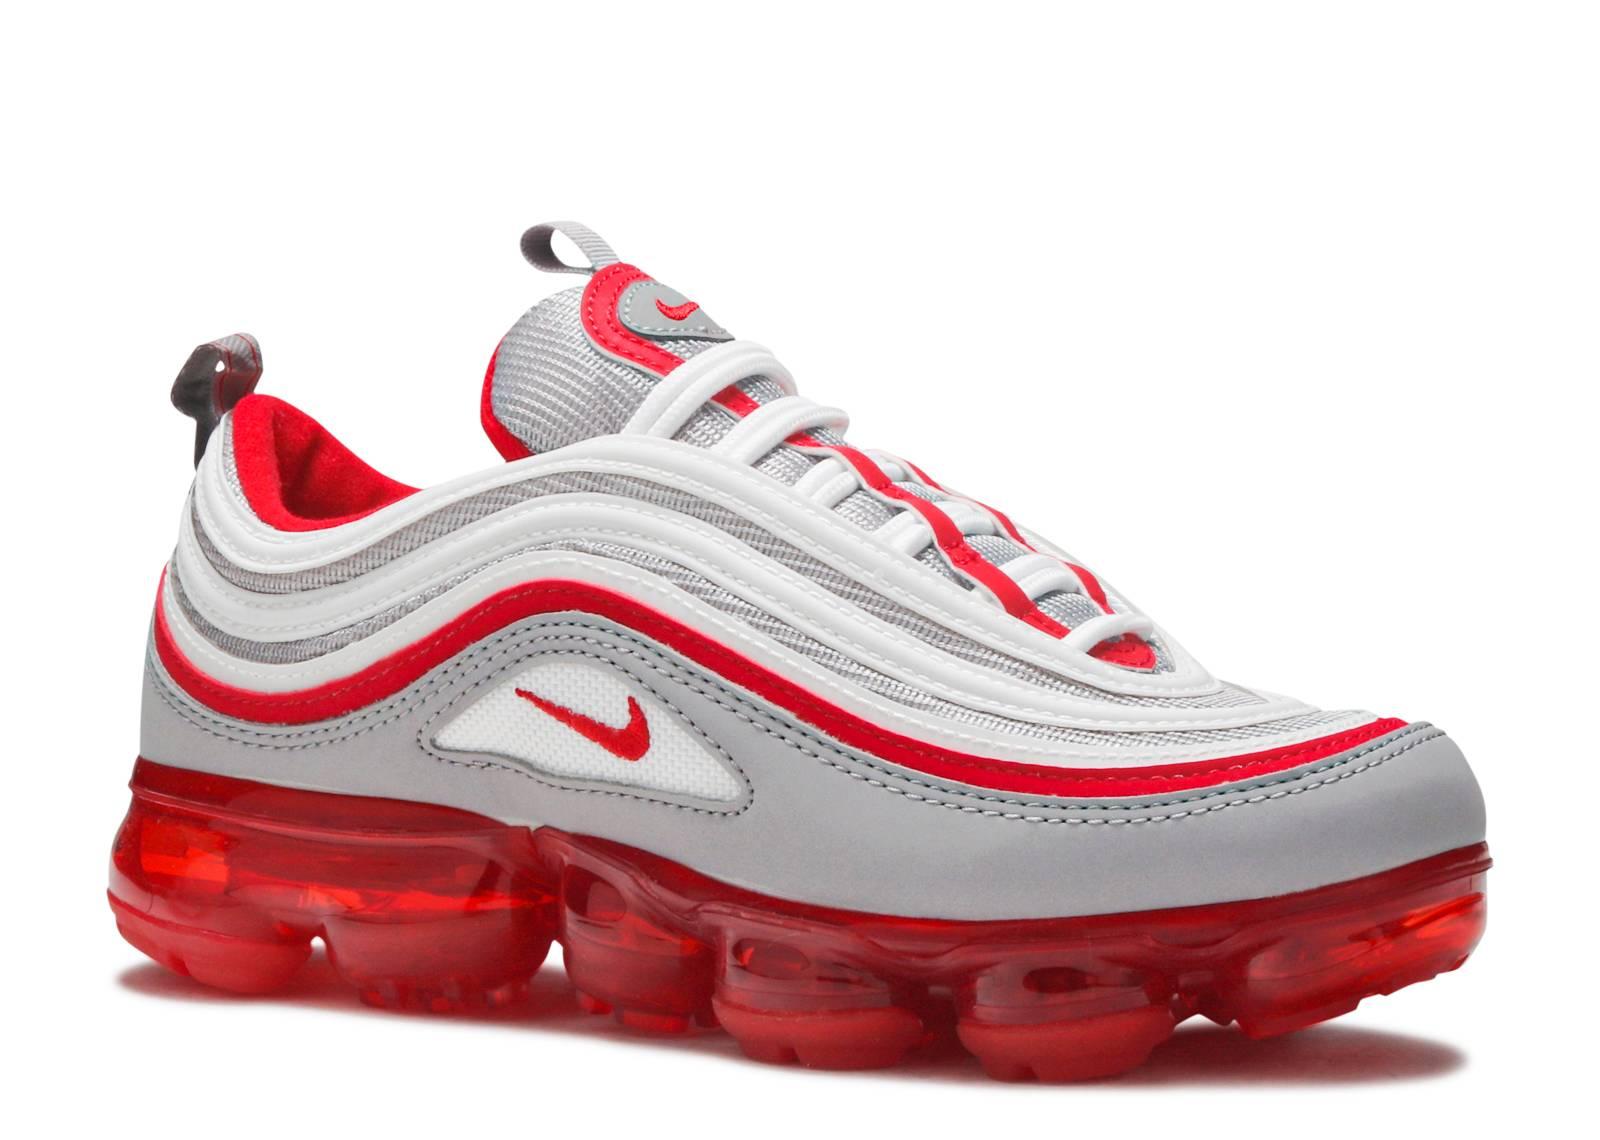 Nike air vapor max 97 red Nike air vapor max 97 red   Schuhe